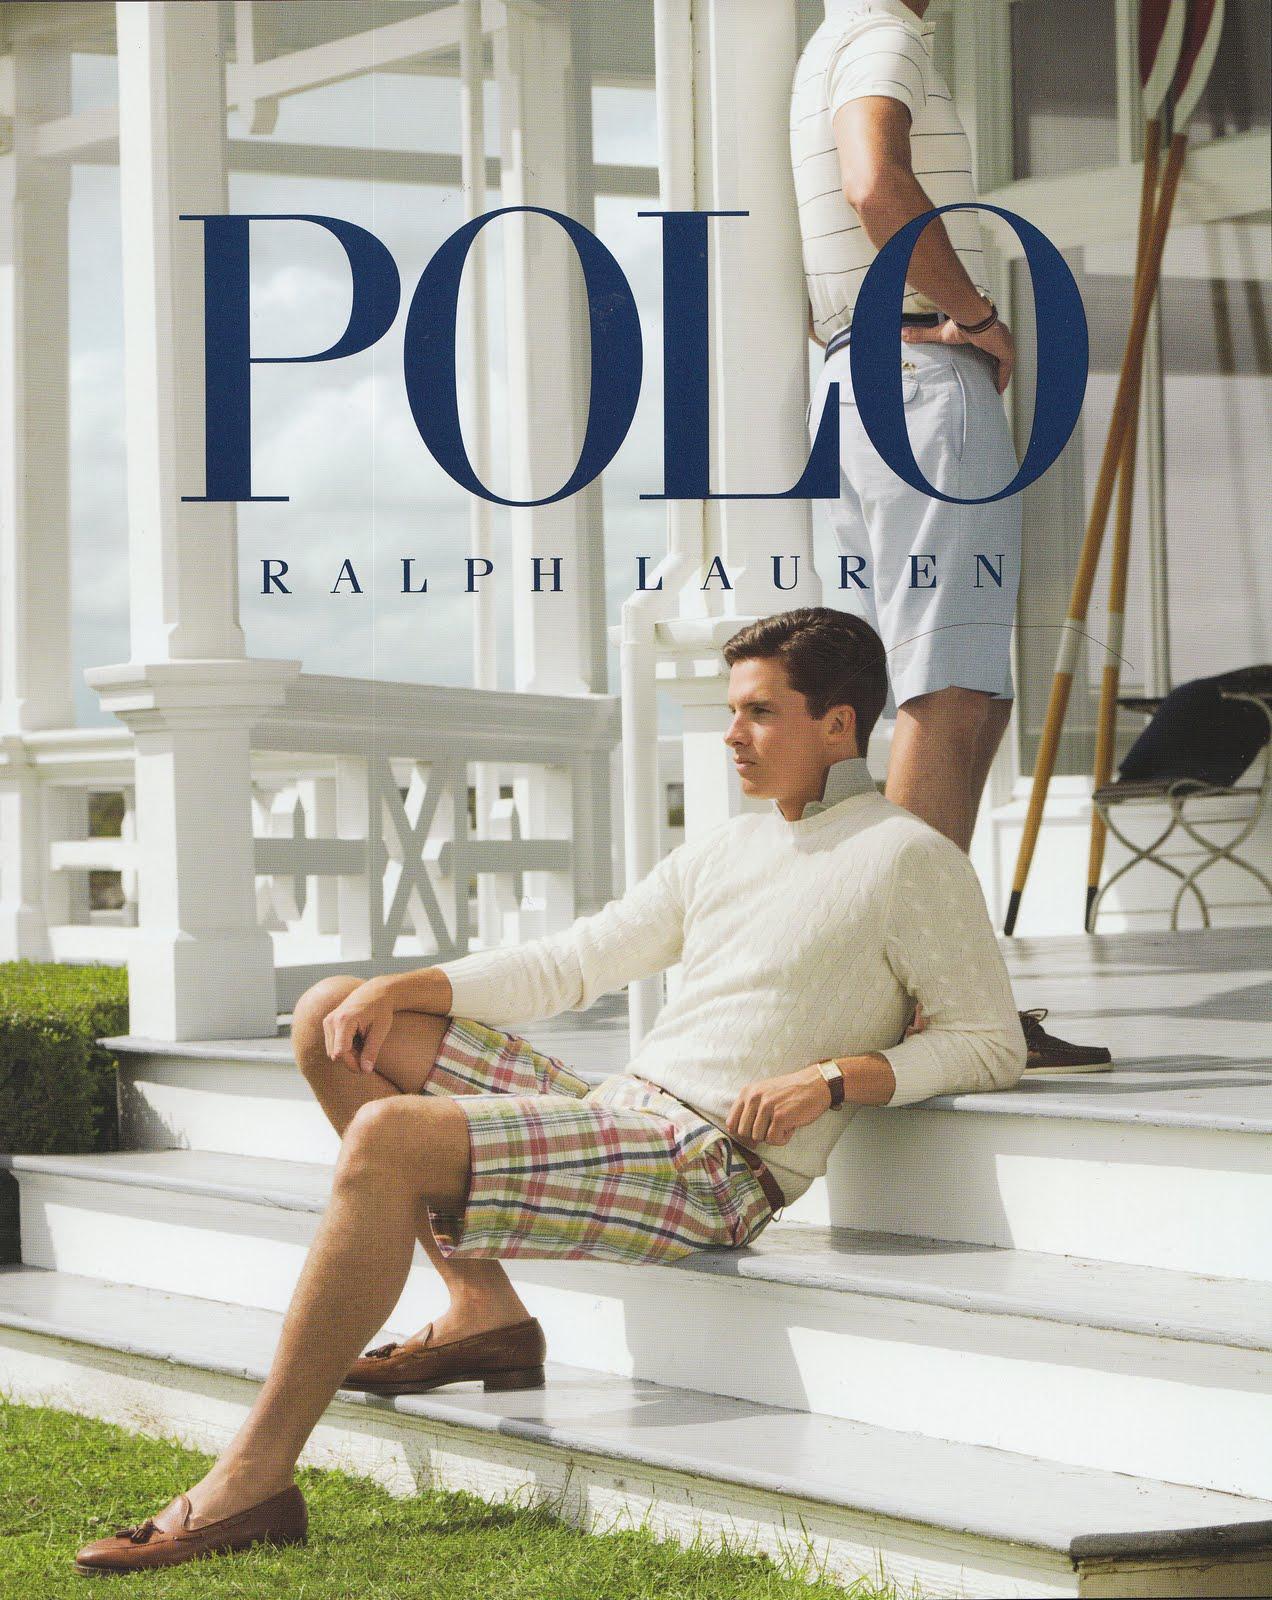 Polo Ralph Lauren Spring Summer 2010 Ad Campaign ...  Ralph Lauren Polo Ad